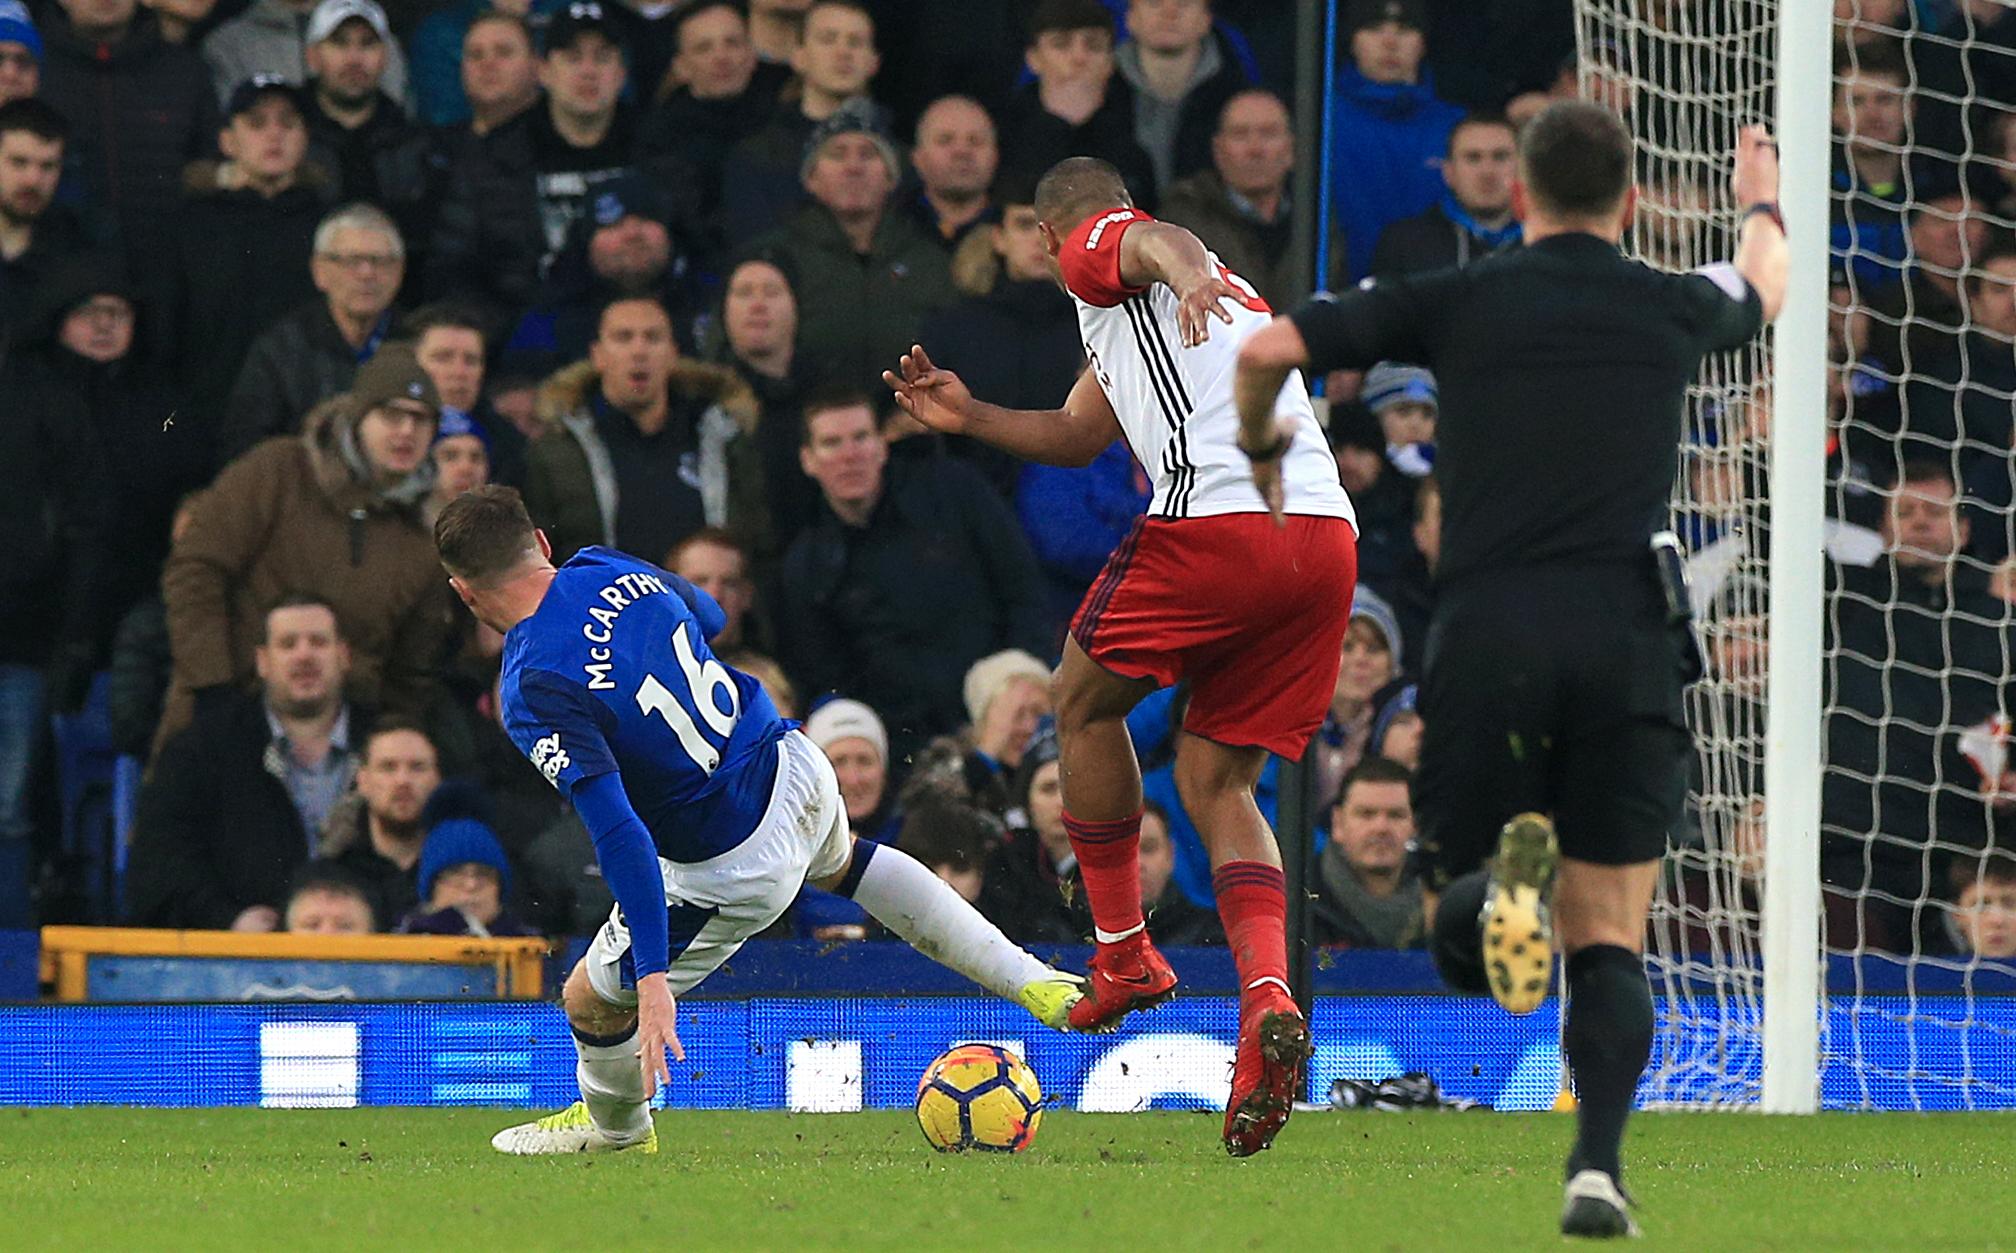 James McCarthy suffers double leg fracture, Everton confirms